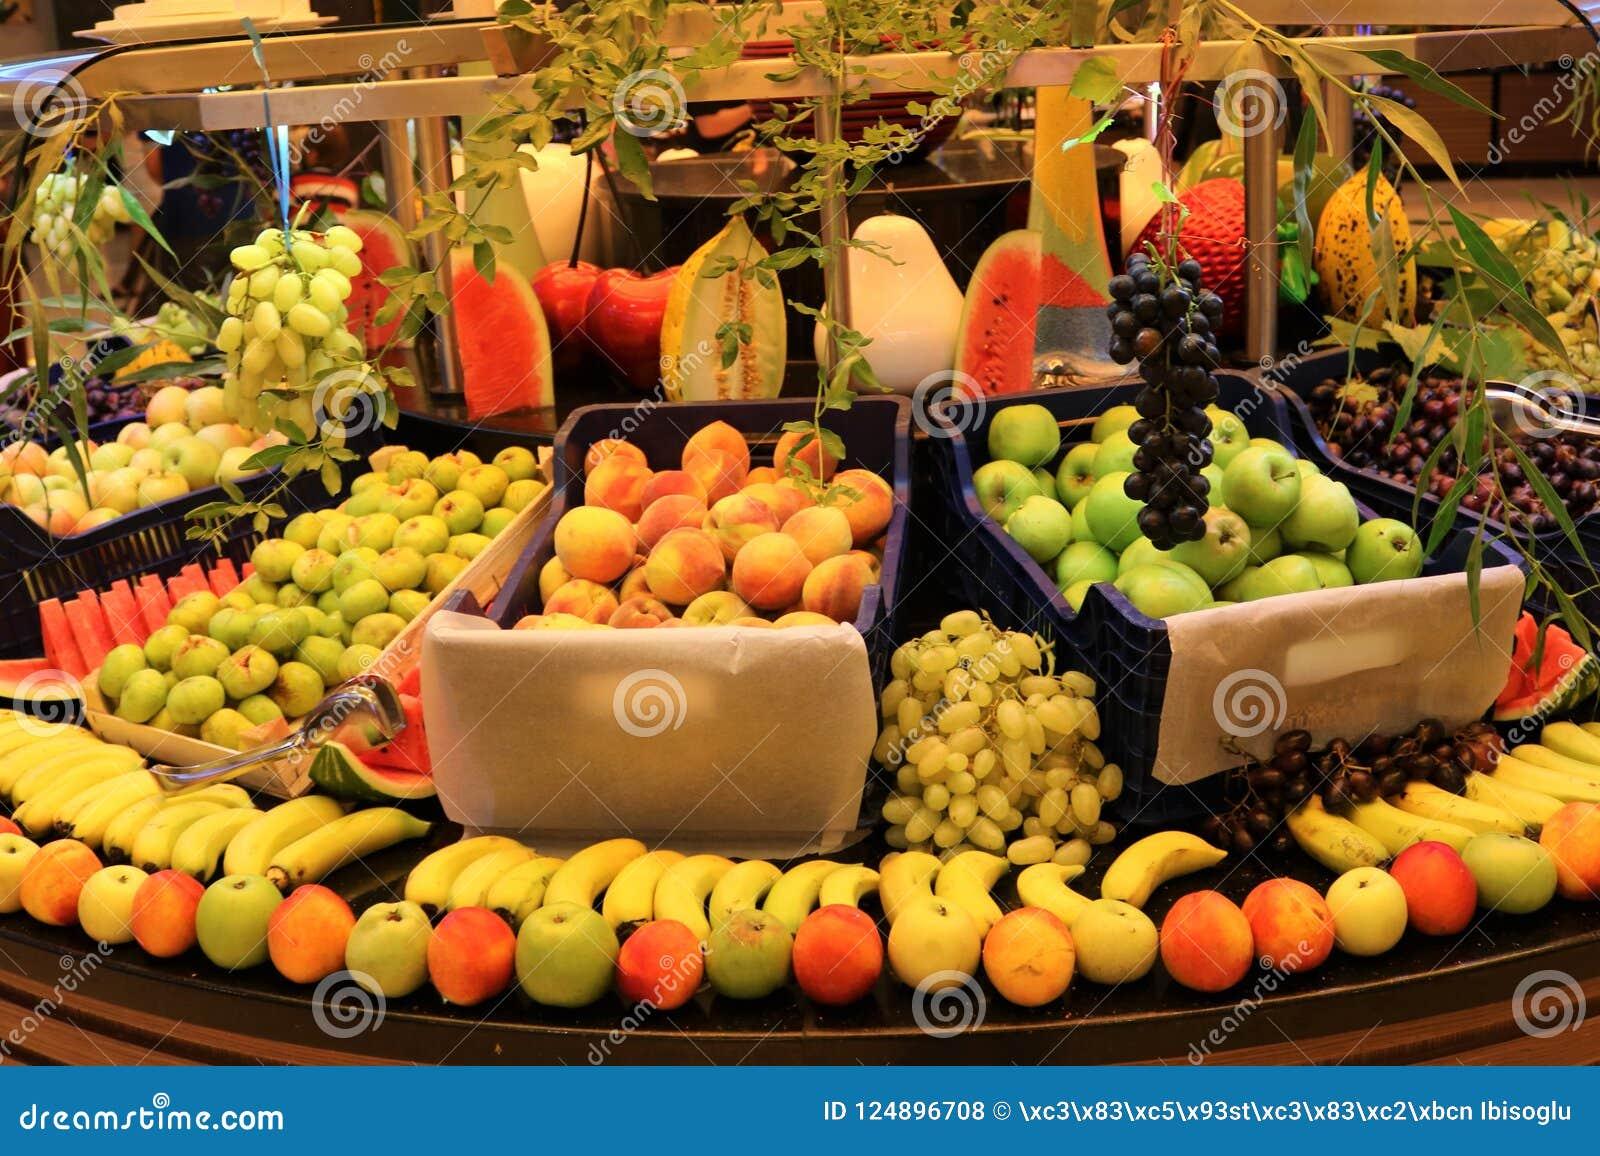 Groentehandelaar Fruitwinkel Vers fruit Fruitmarkt Kruidenierswinkelopslag